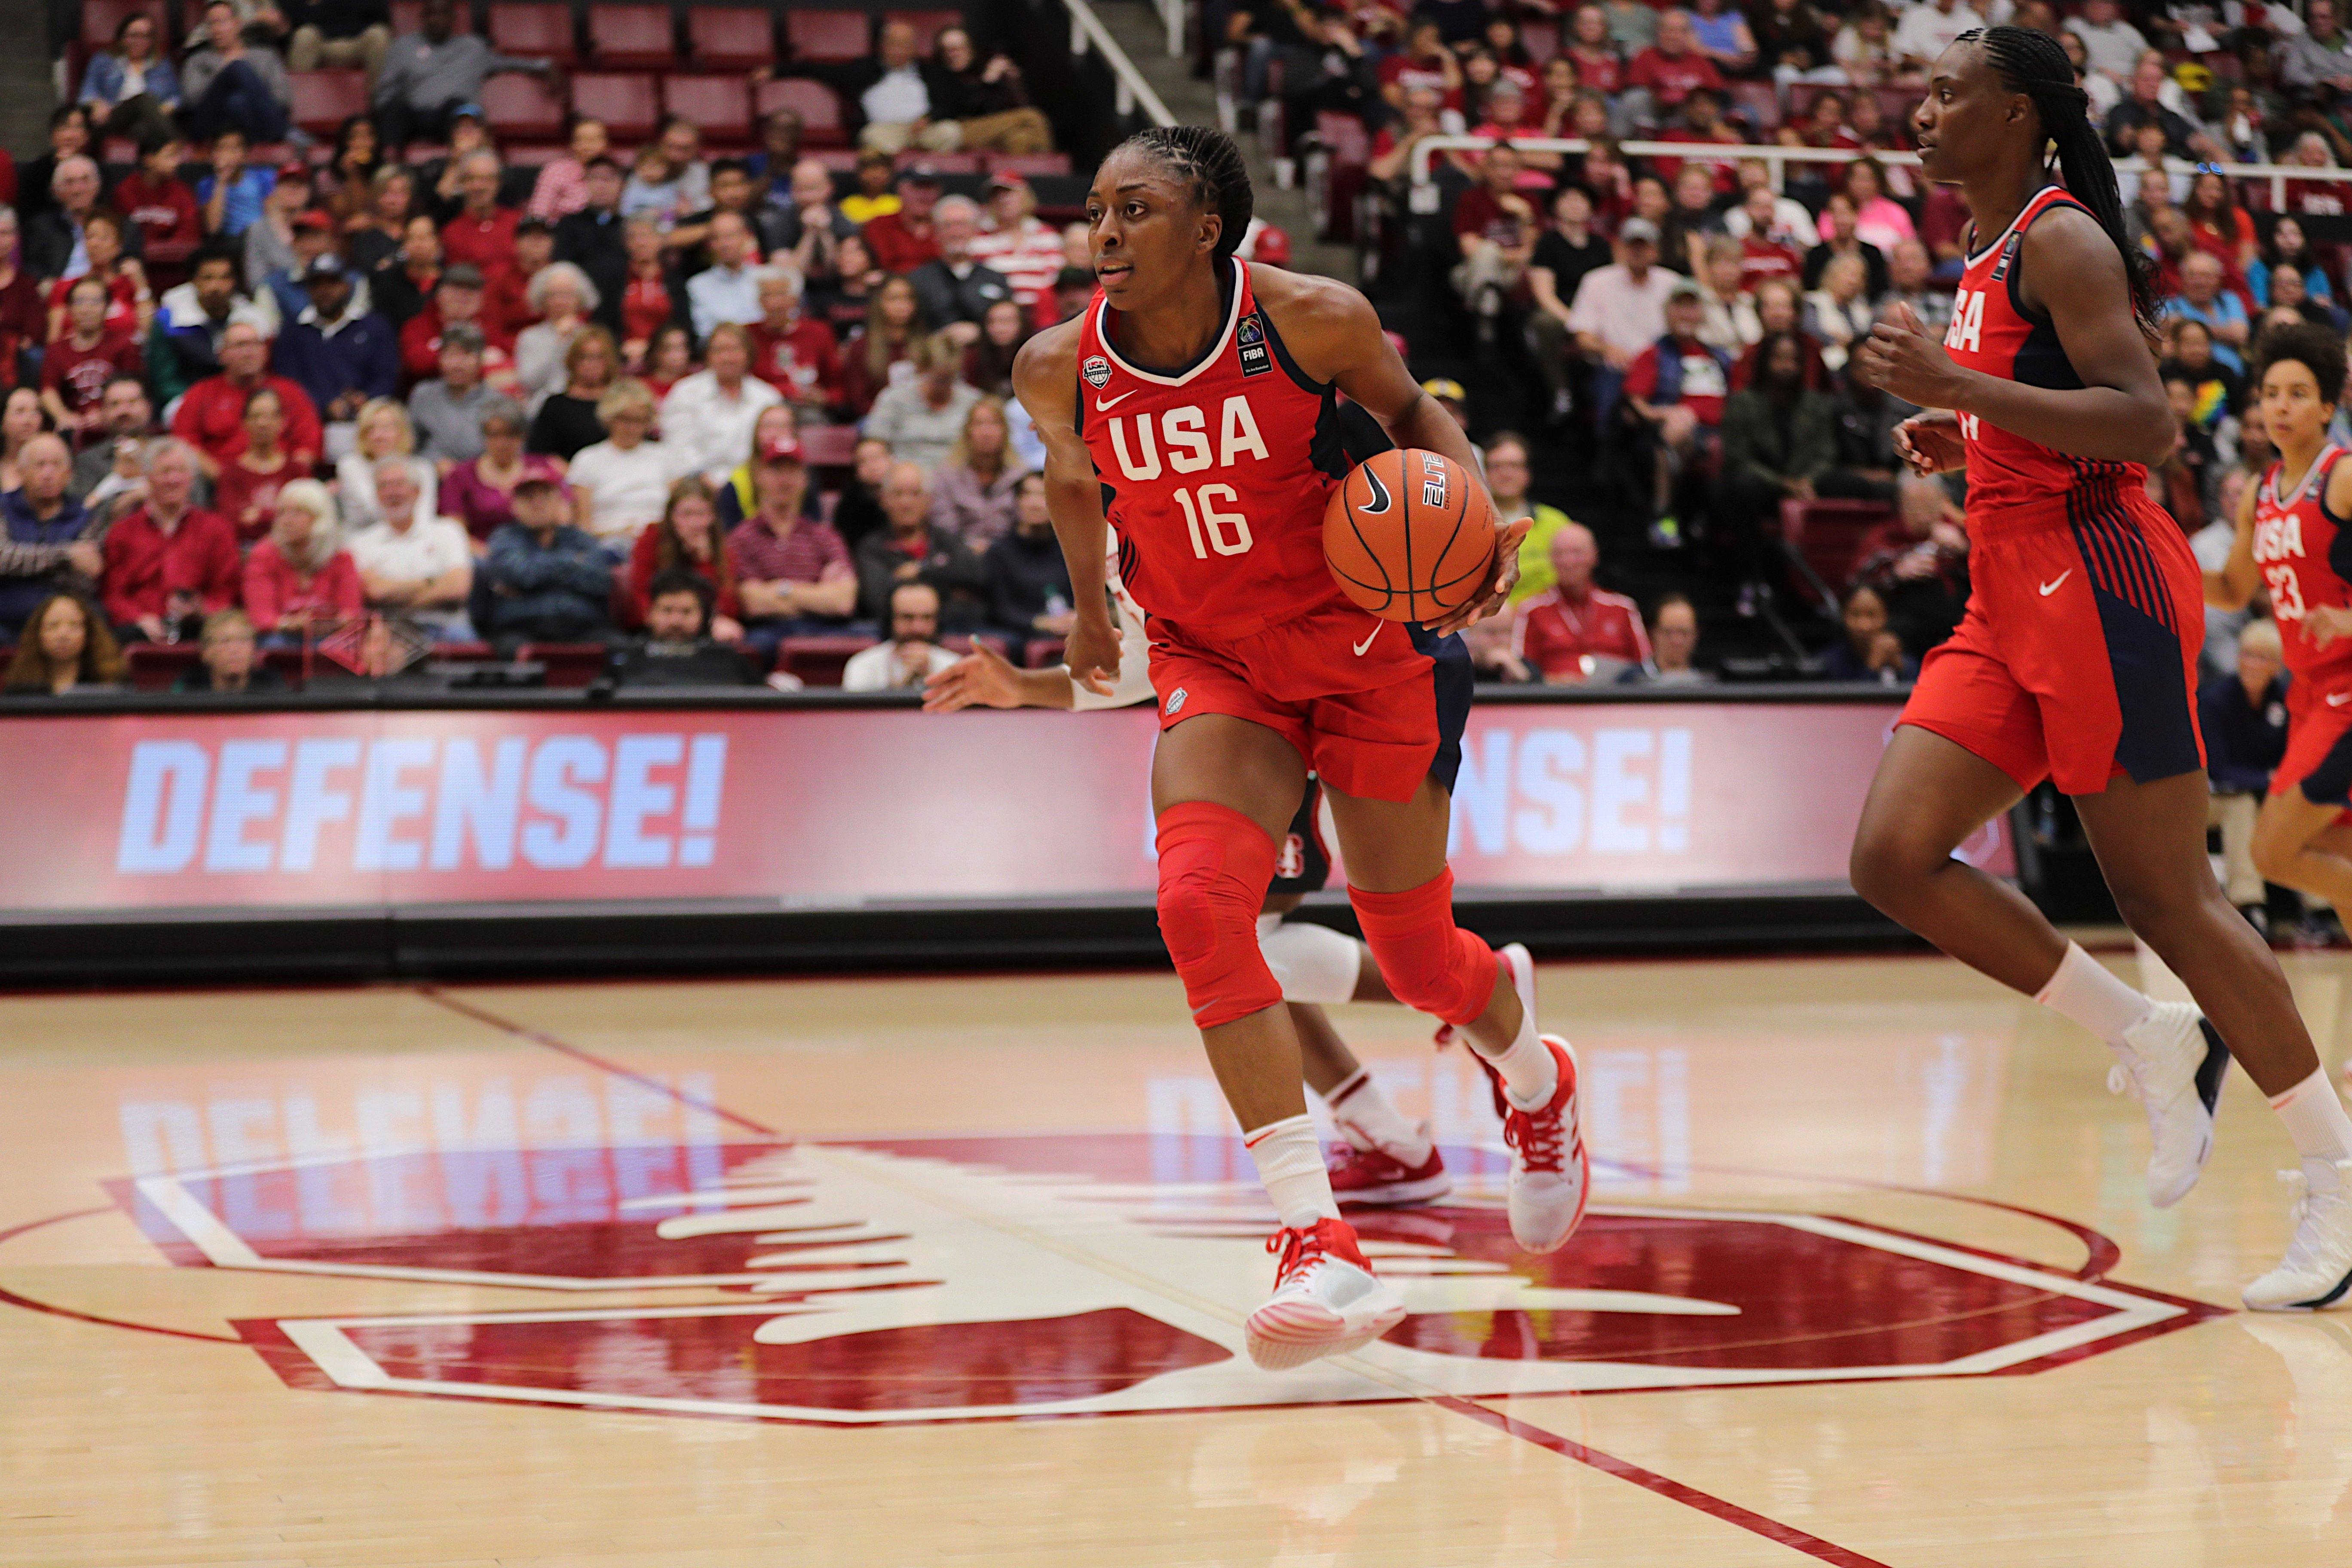 Nneka Ogwumike '12 playing basketball